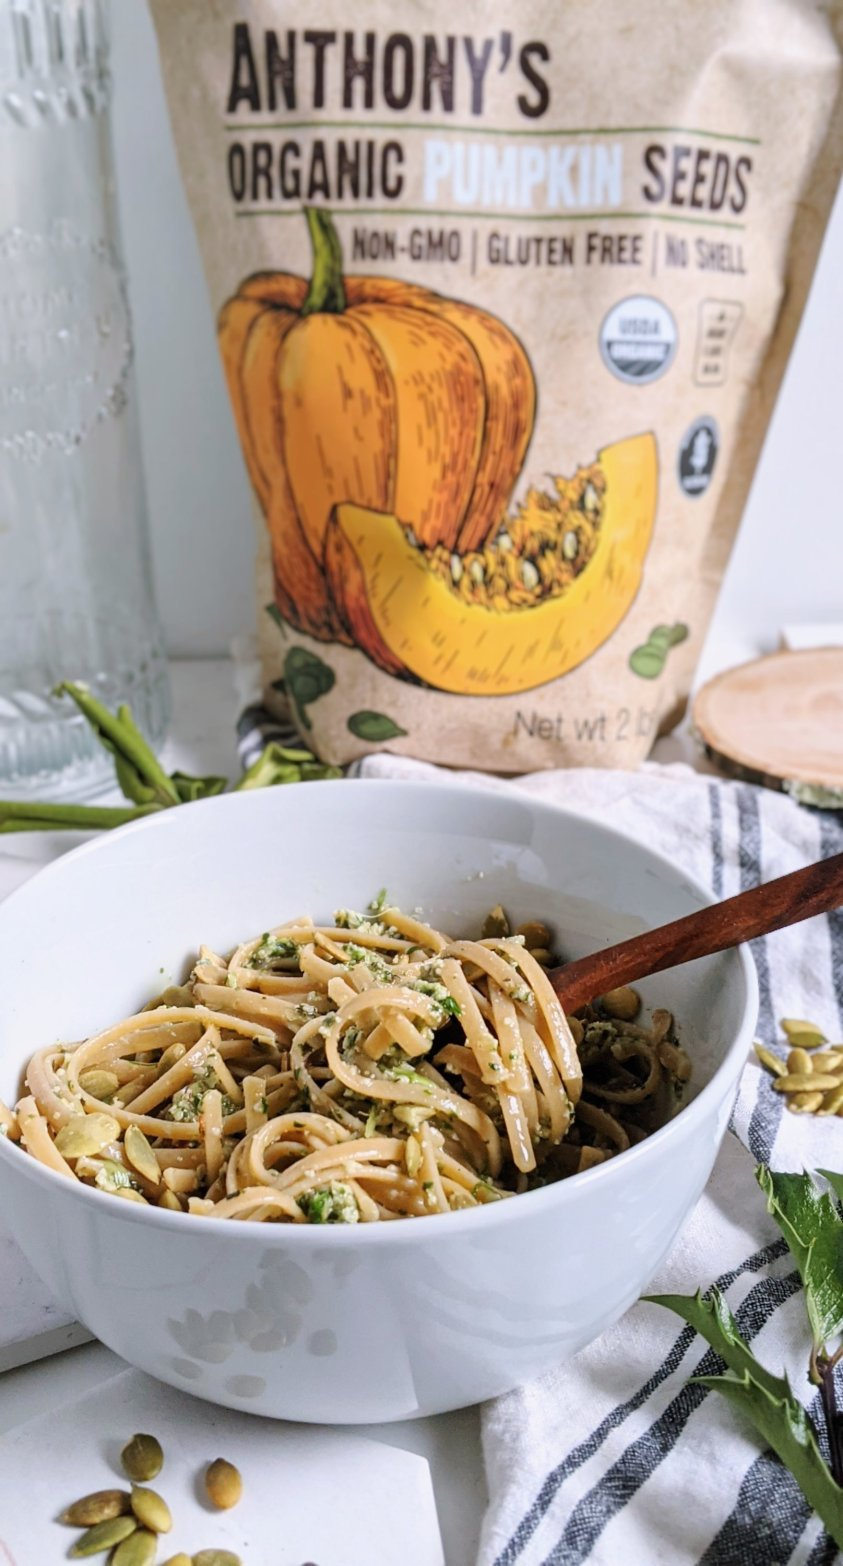 anthony's good pumpkin seeds pepitas pasta ealthy gluten free ut free dairy free pesto recipe with fresh basil herbs parsley kale